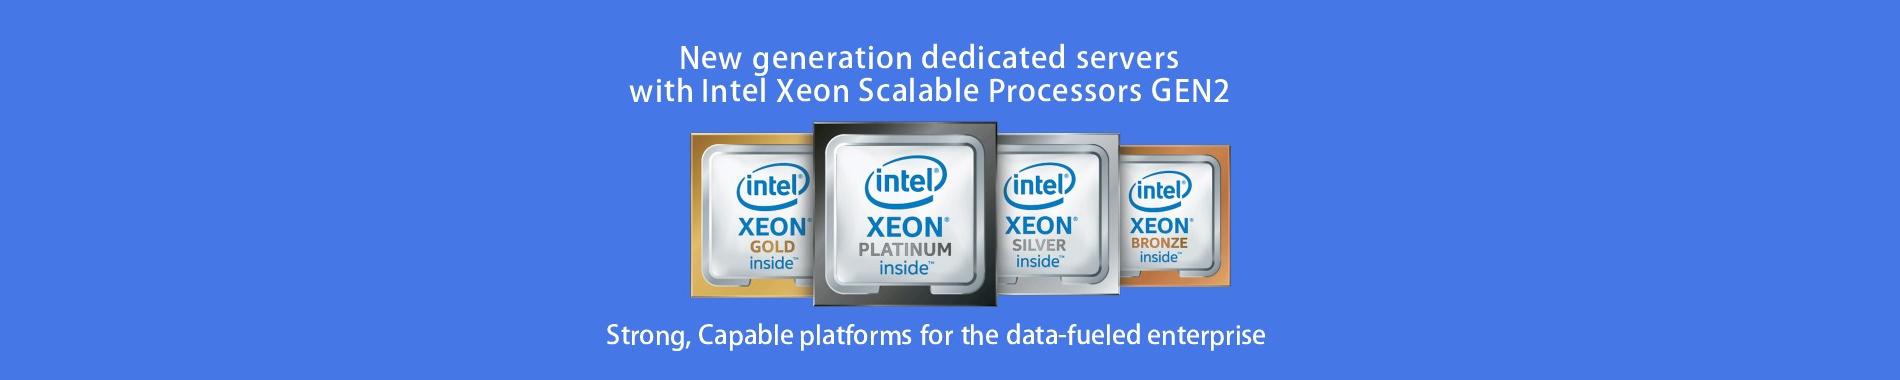 Datanoc scalable dedicated servers